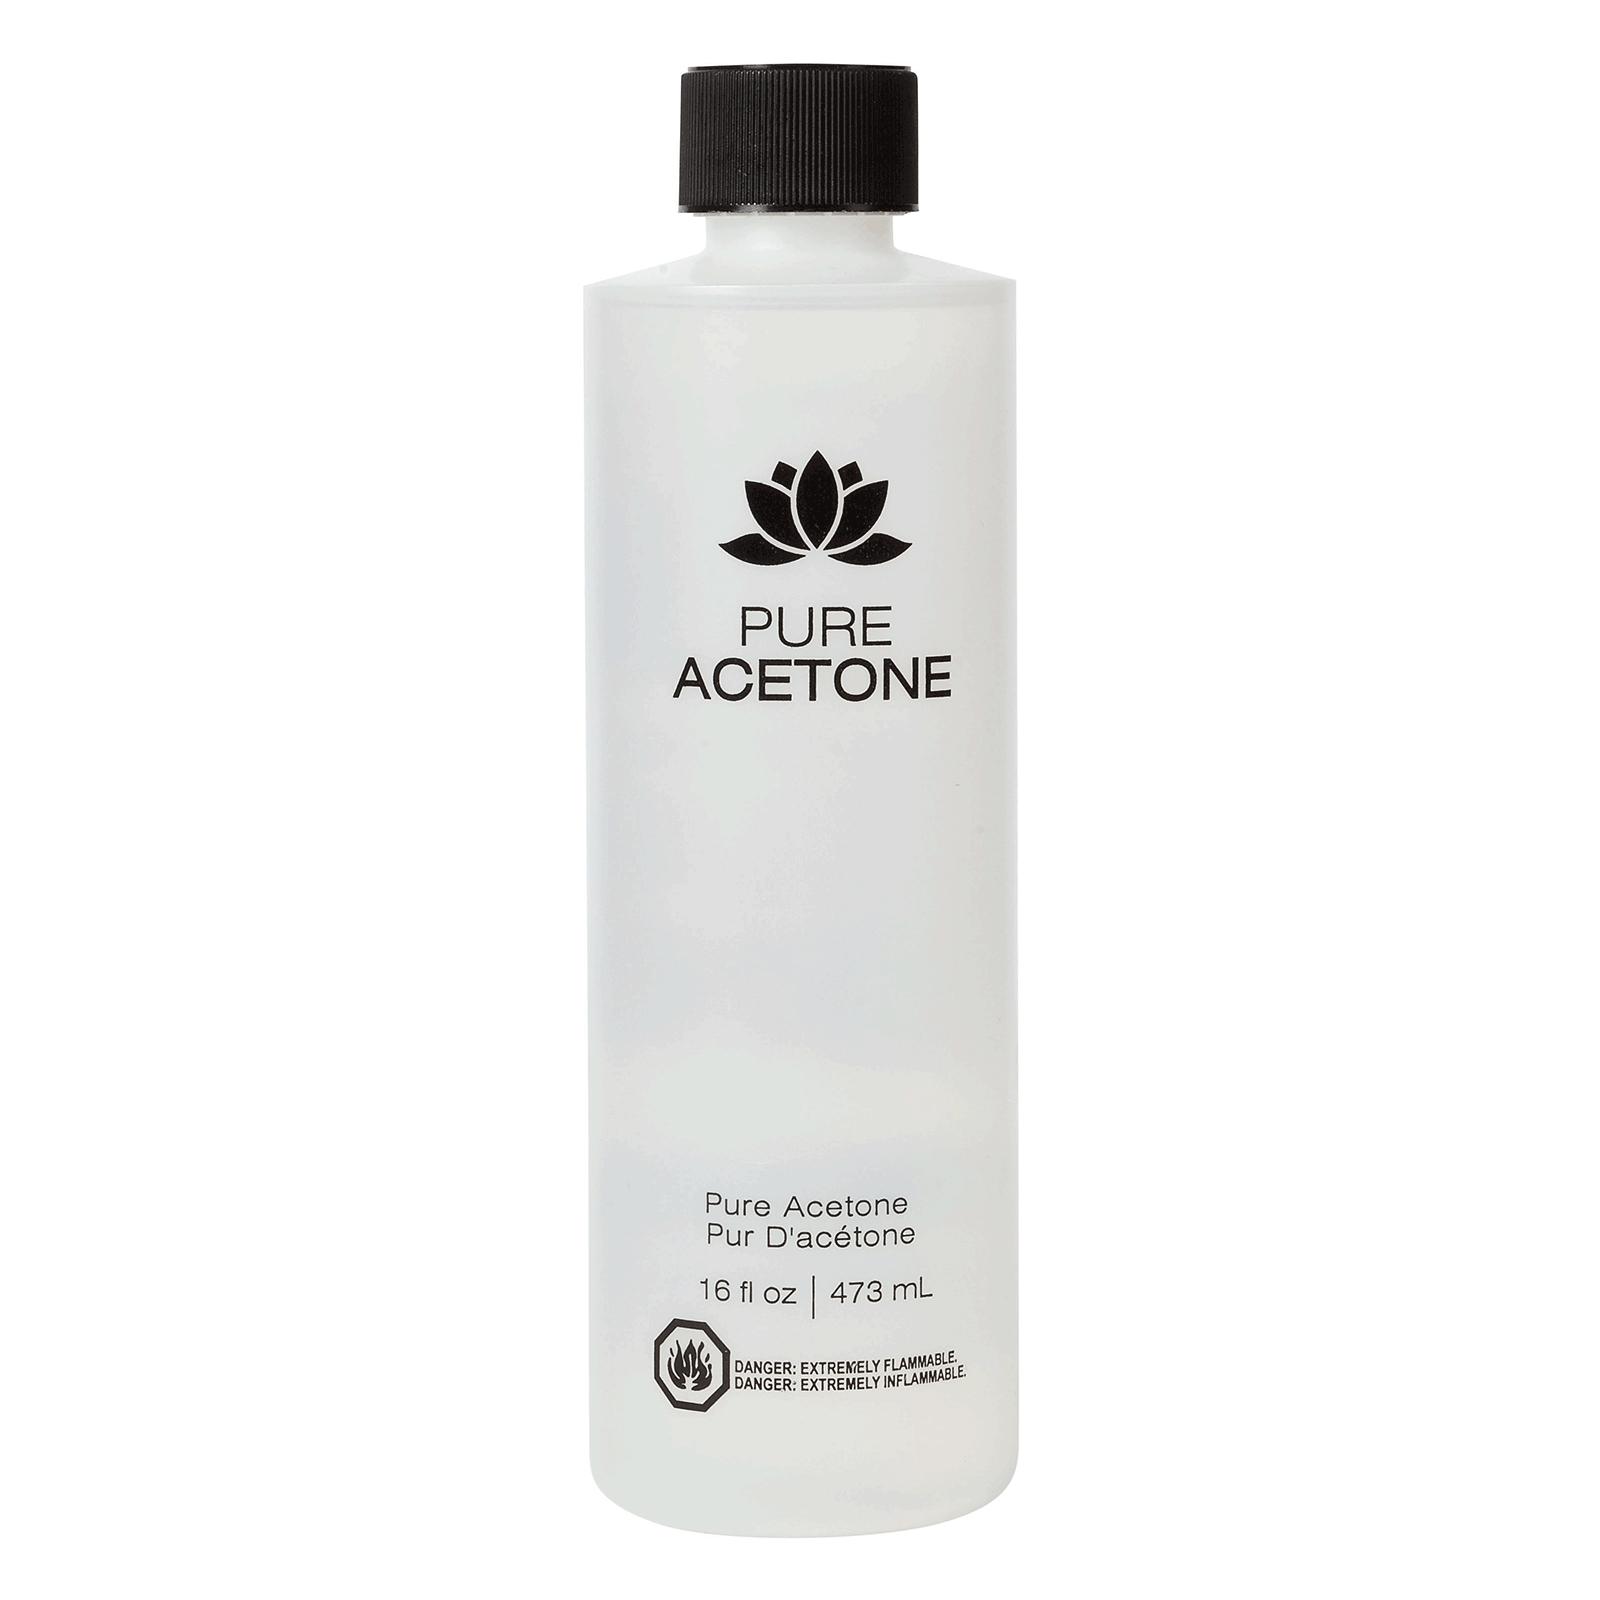 Pure Acetone Nail Polish Remover - Marianna | CosmoProf